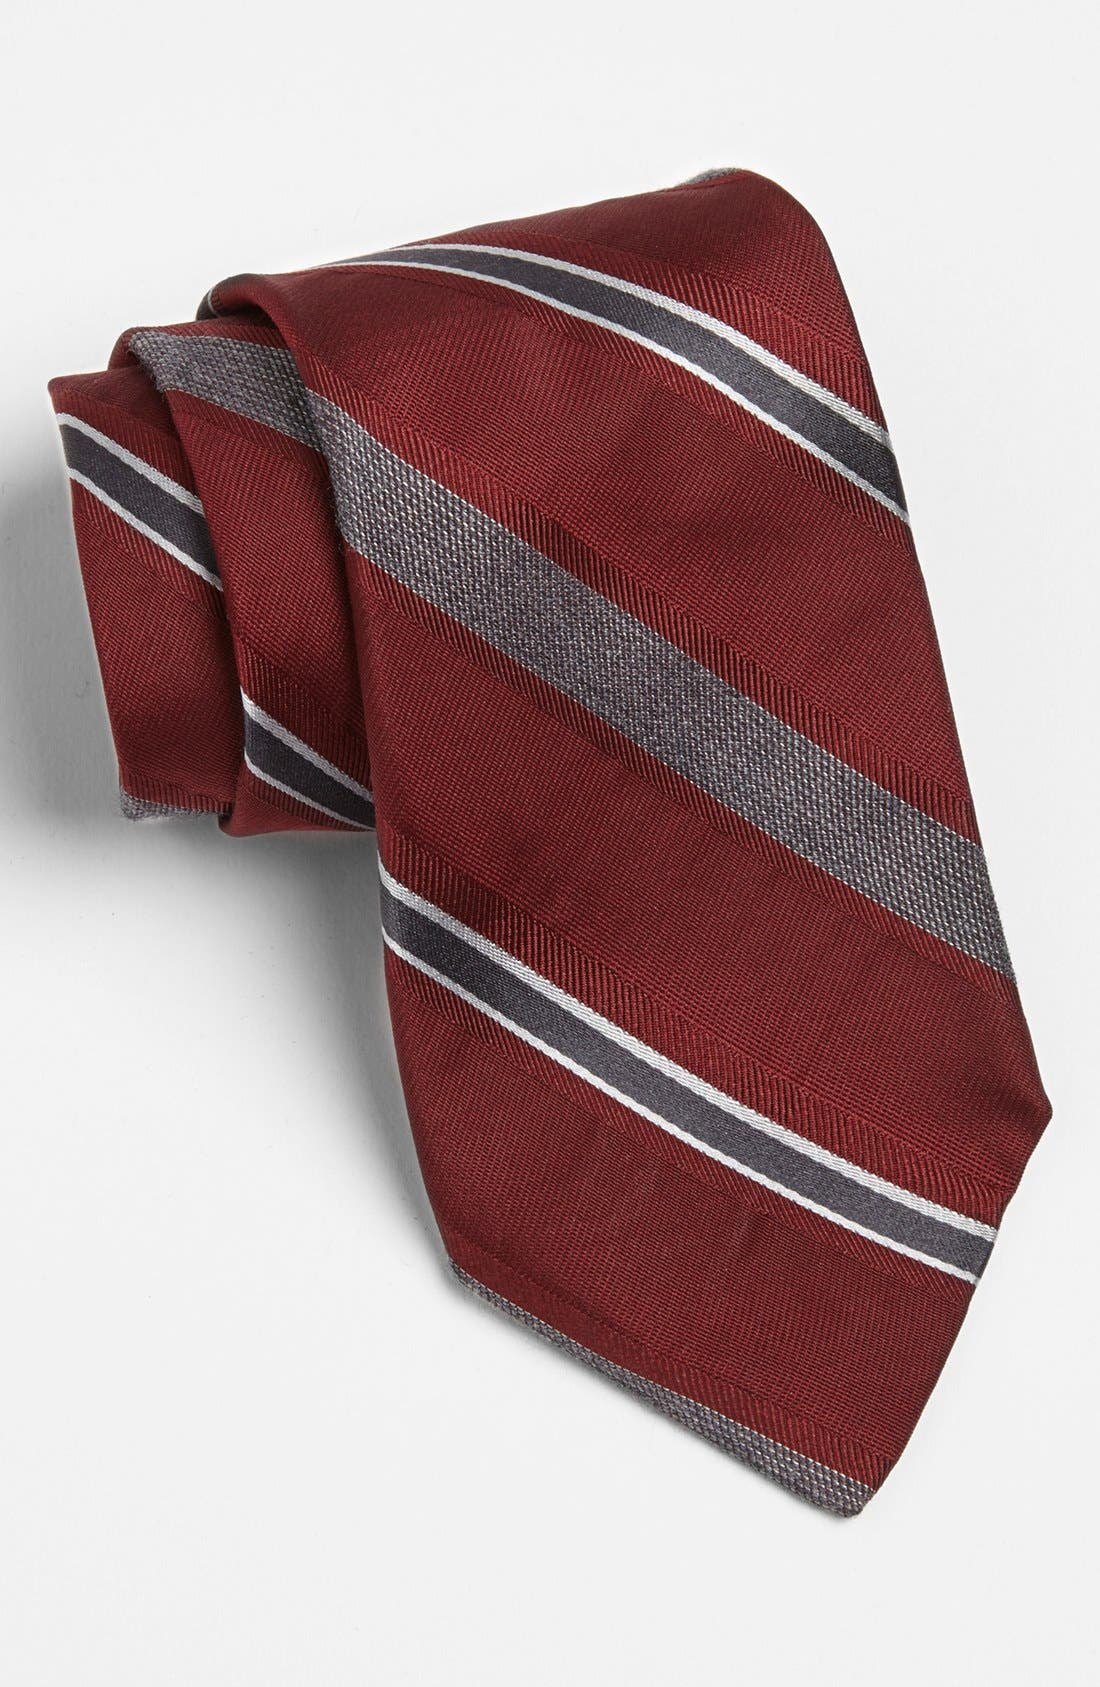 Main Image - Michael Kors Woven Tie